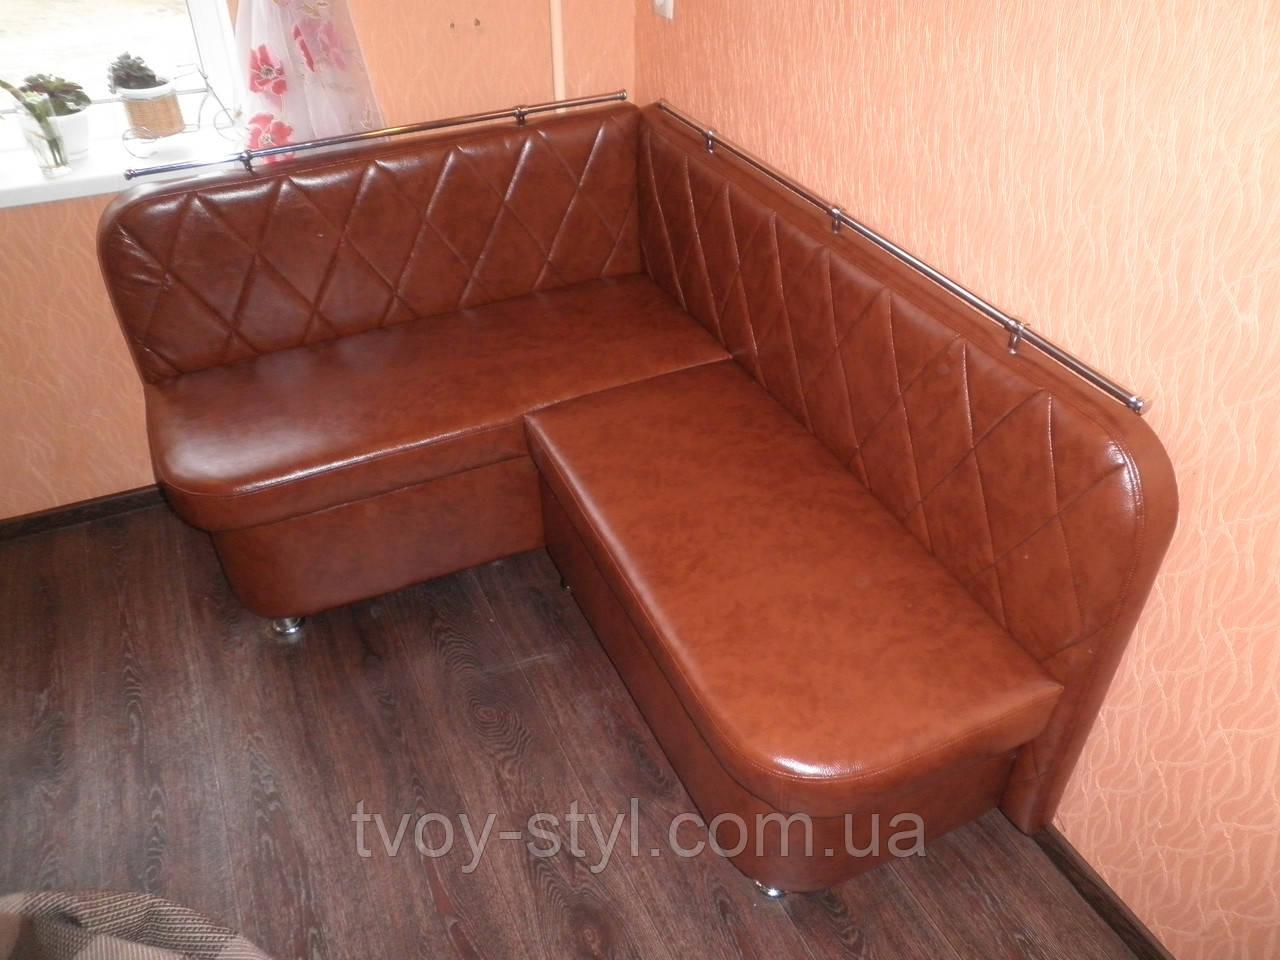 Перетяжка мебели Днепропетровск